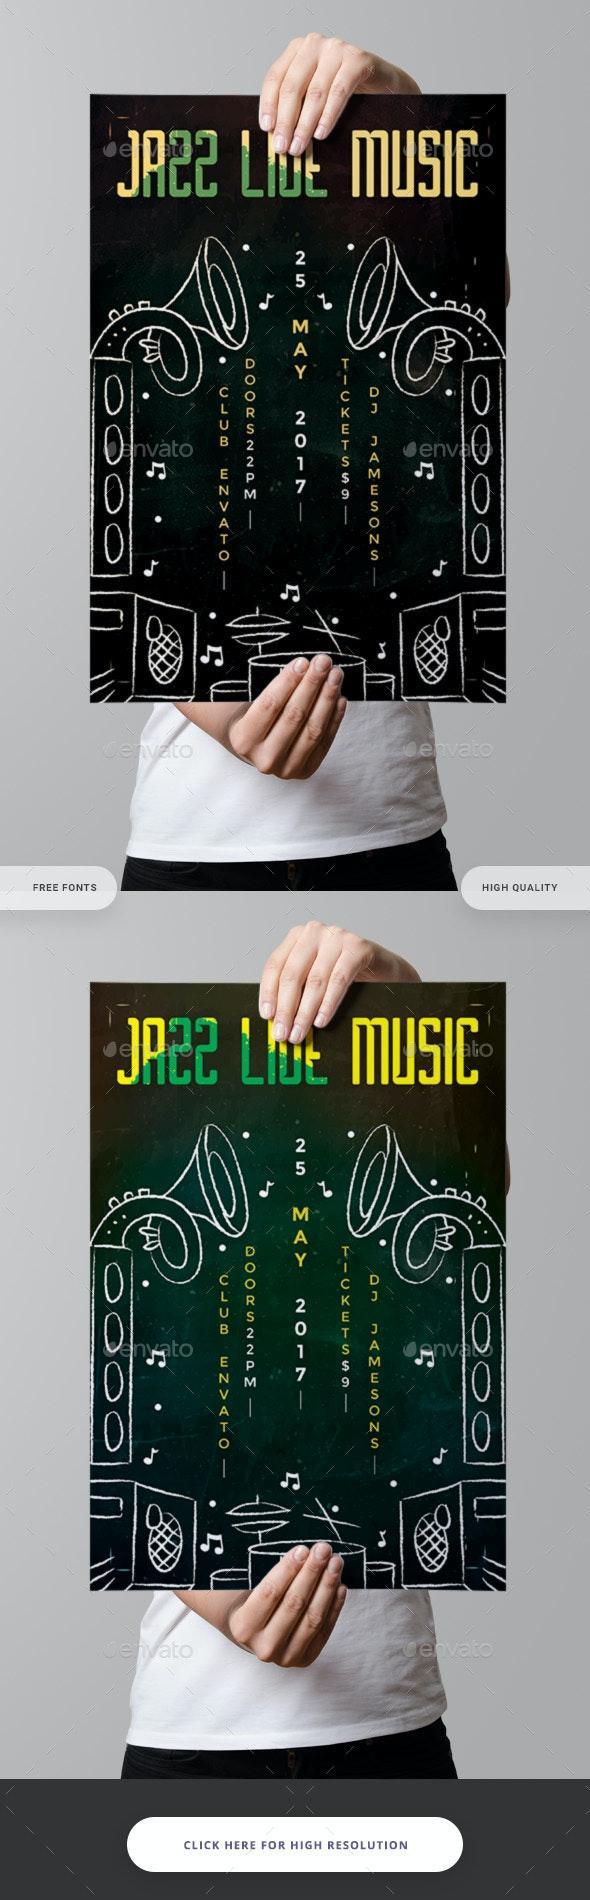 Jazz Live Music Concert Flyer - Clubs & Parties Events